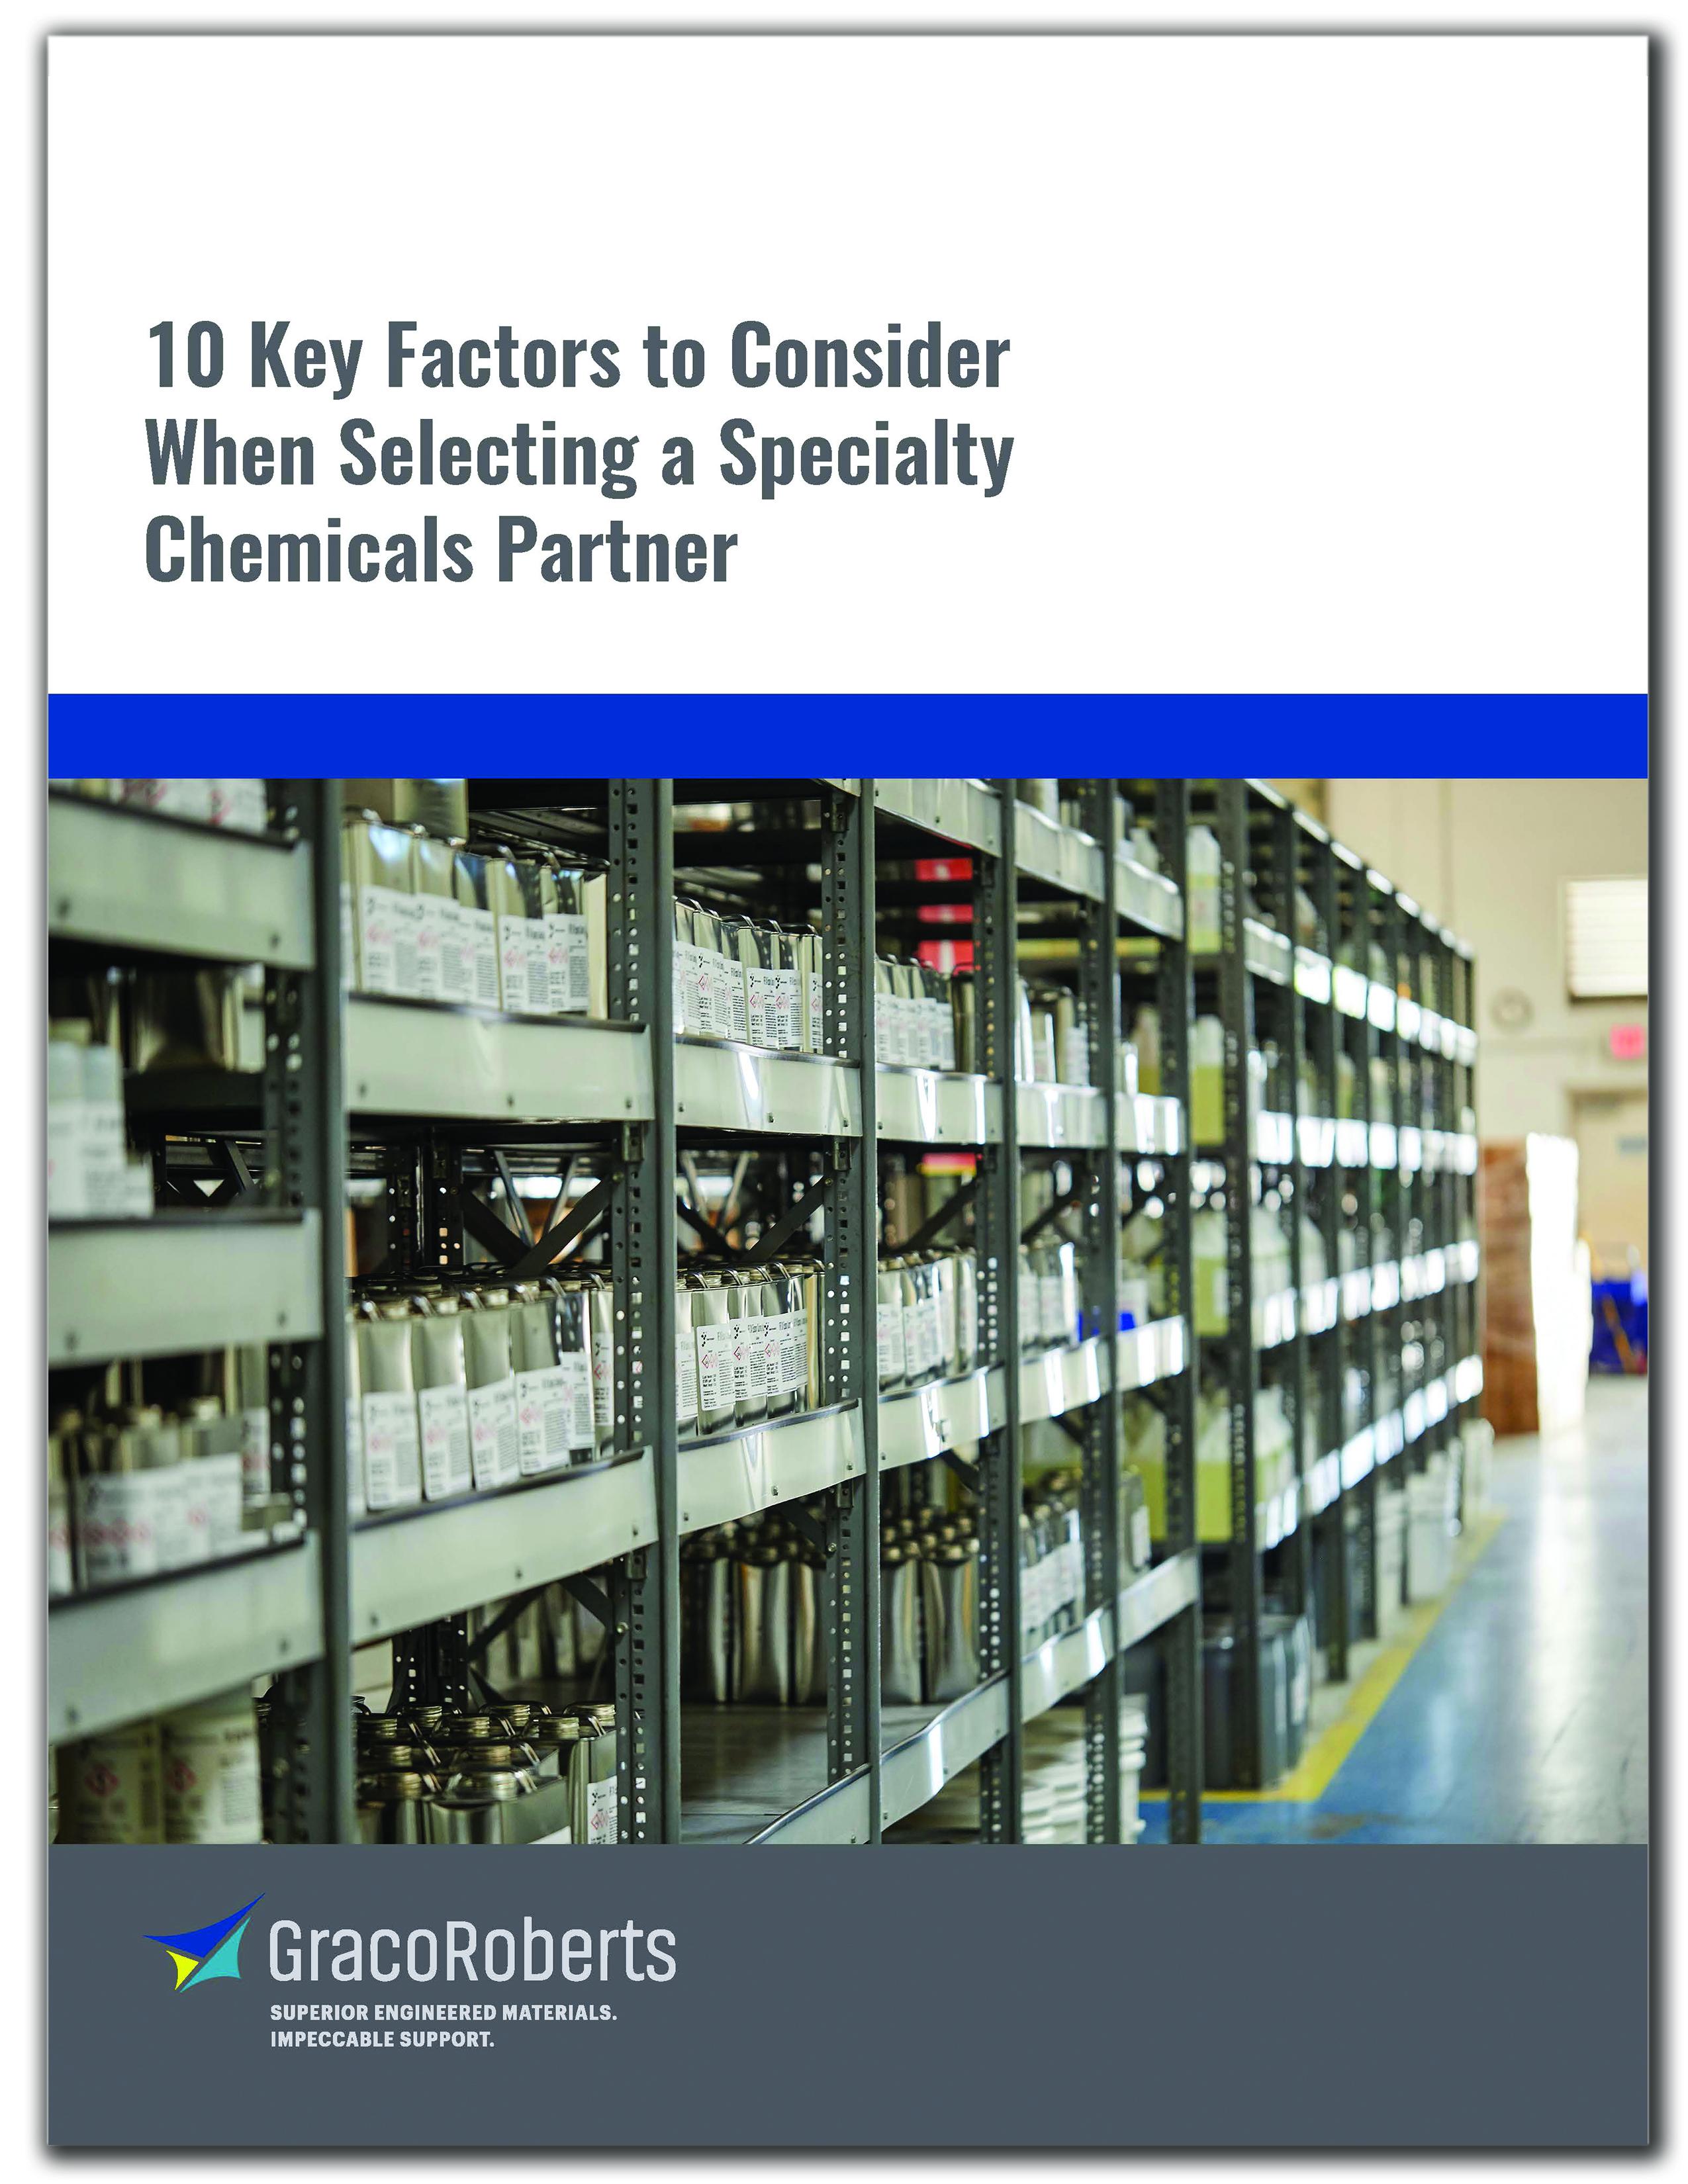 Whitepaper Cover - 10 Key Factors